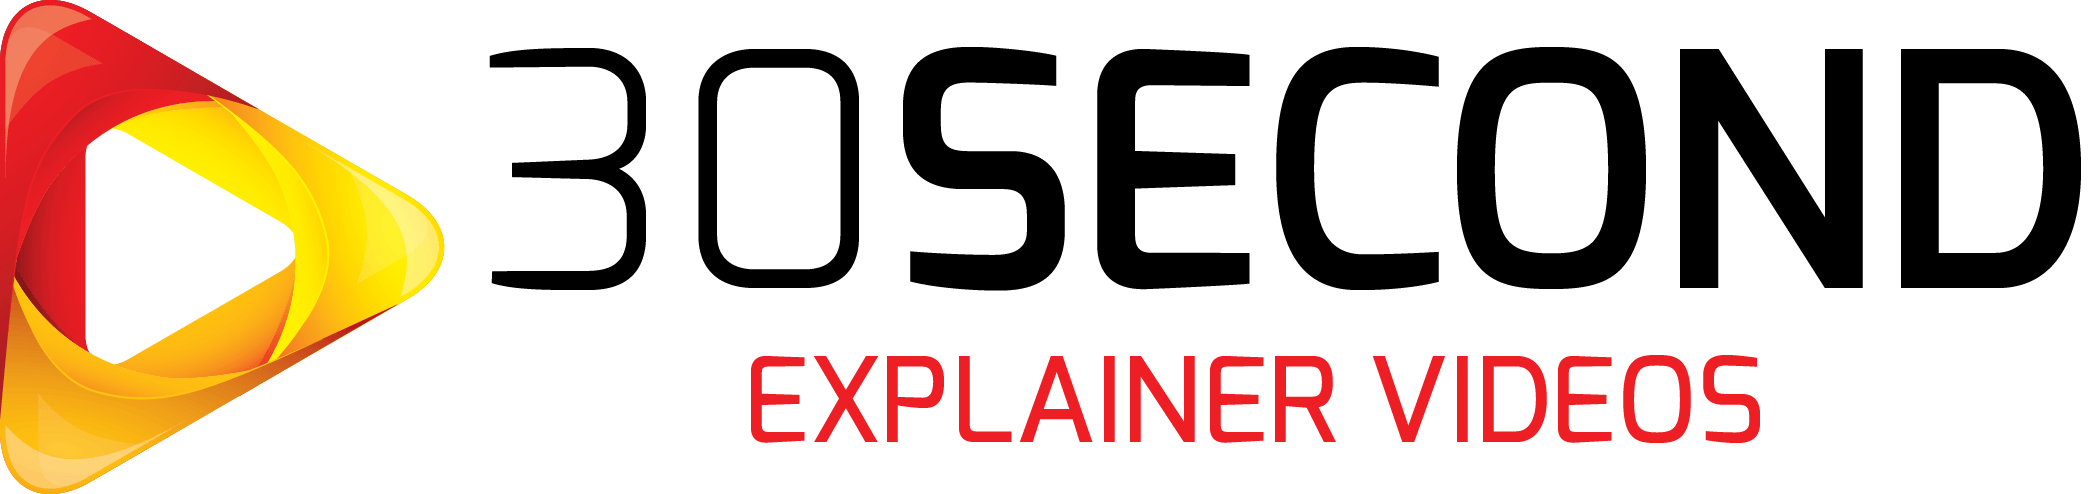 30 Second Explainer Videos